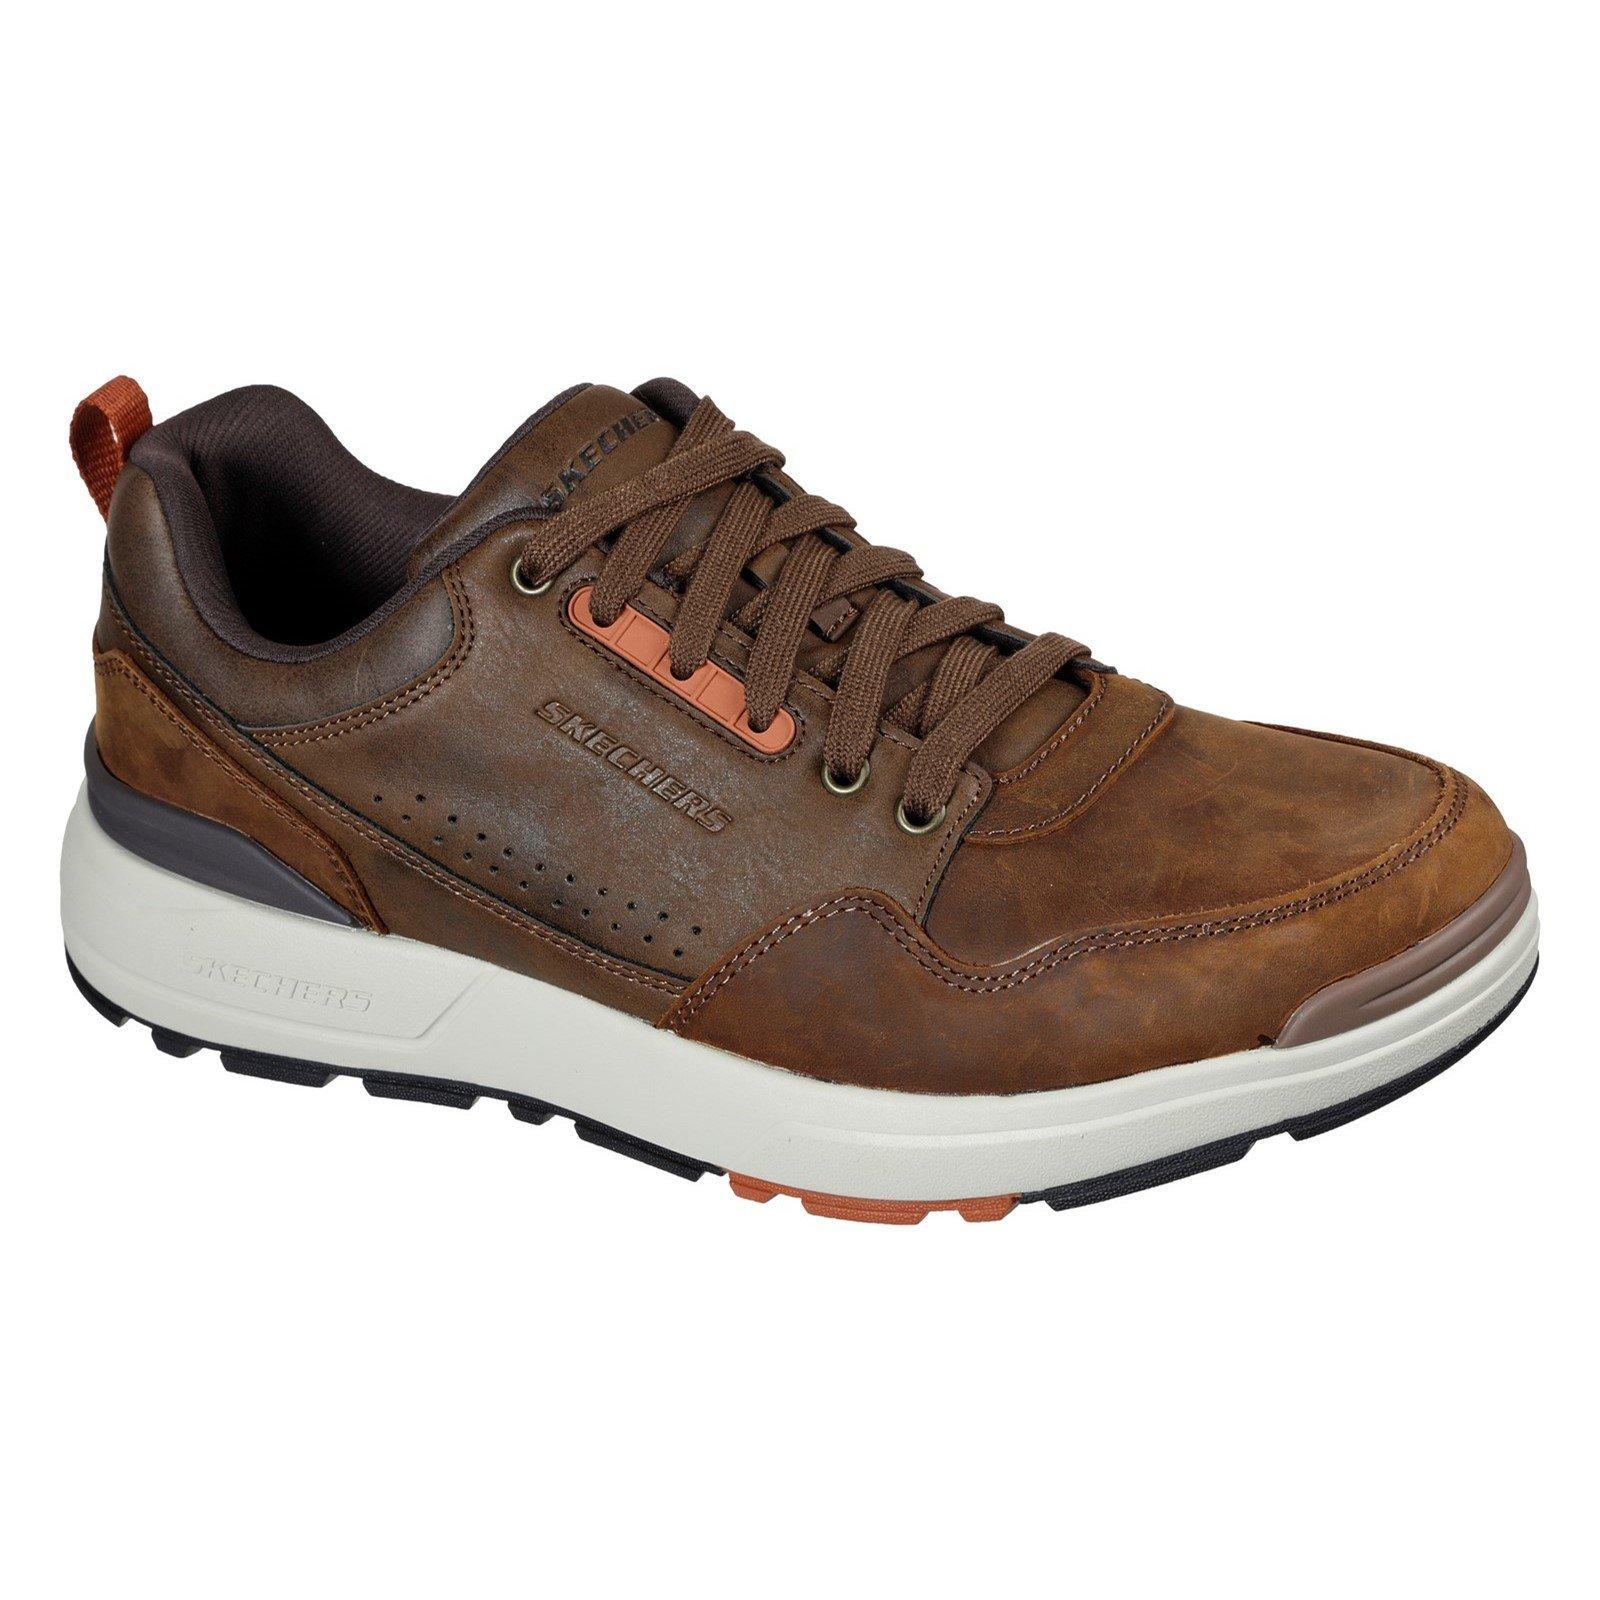 Skechers Men's Rozier Mancer Trainer Multicolor 32450 - Chocolate/Dark Brown 7